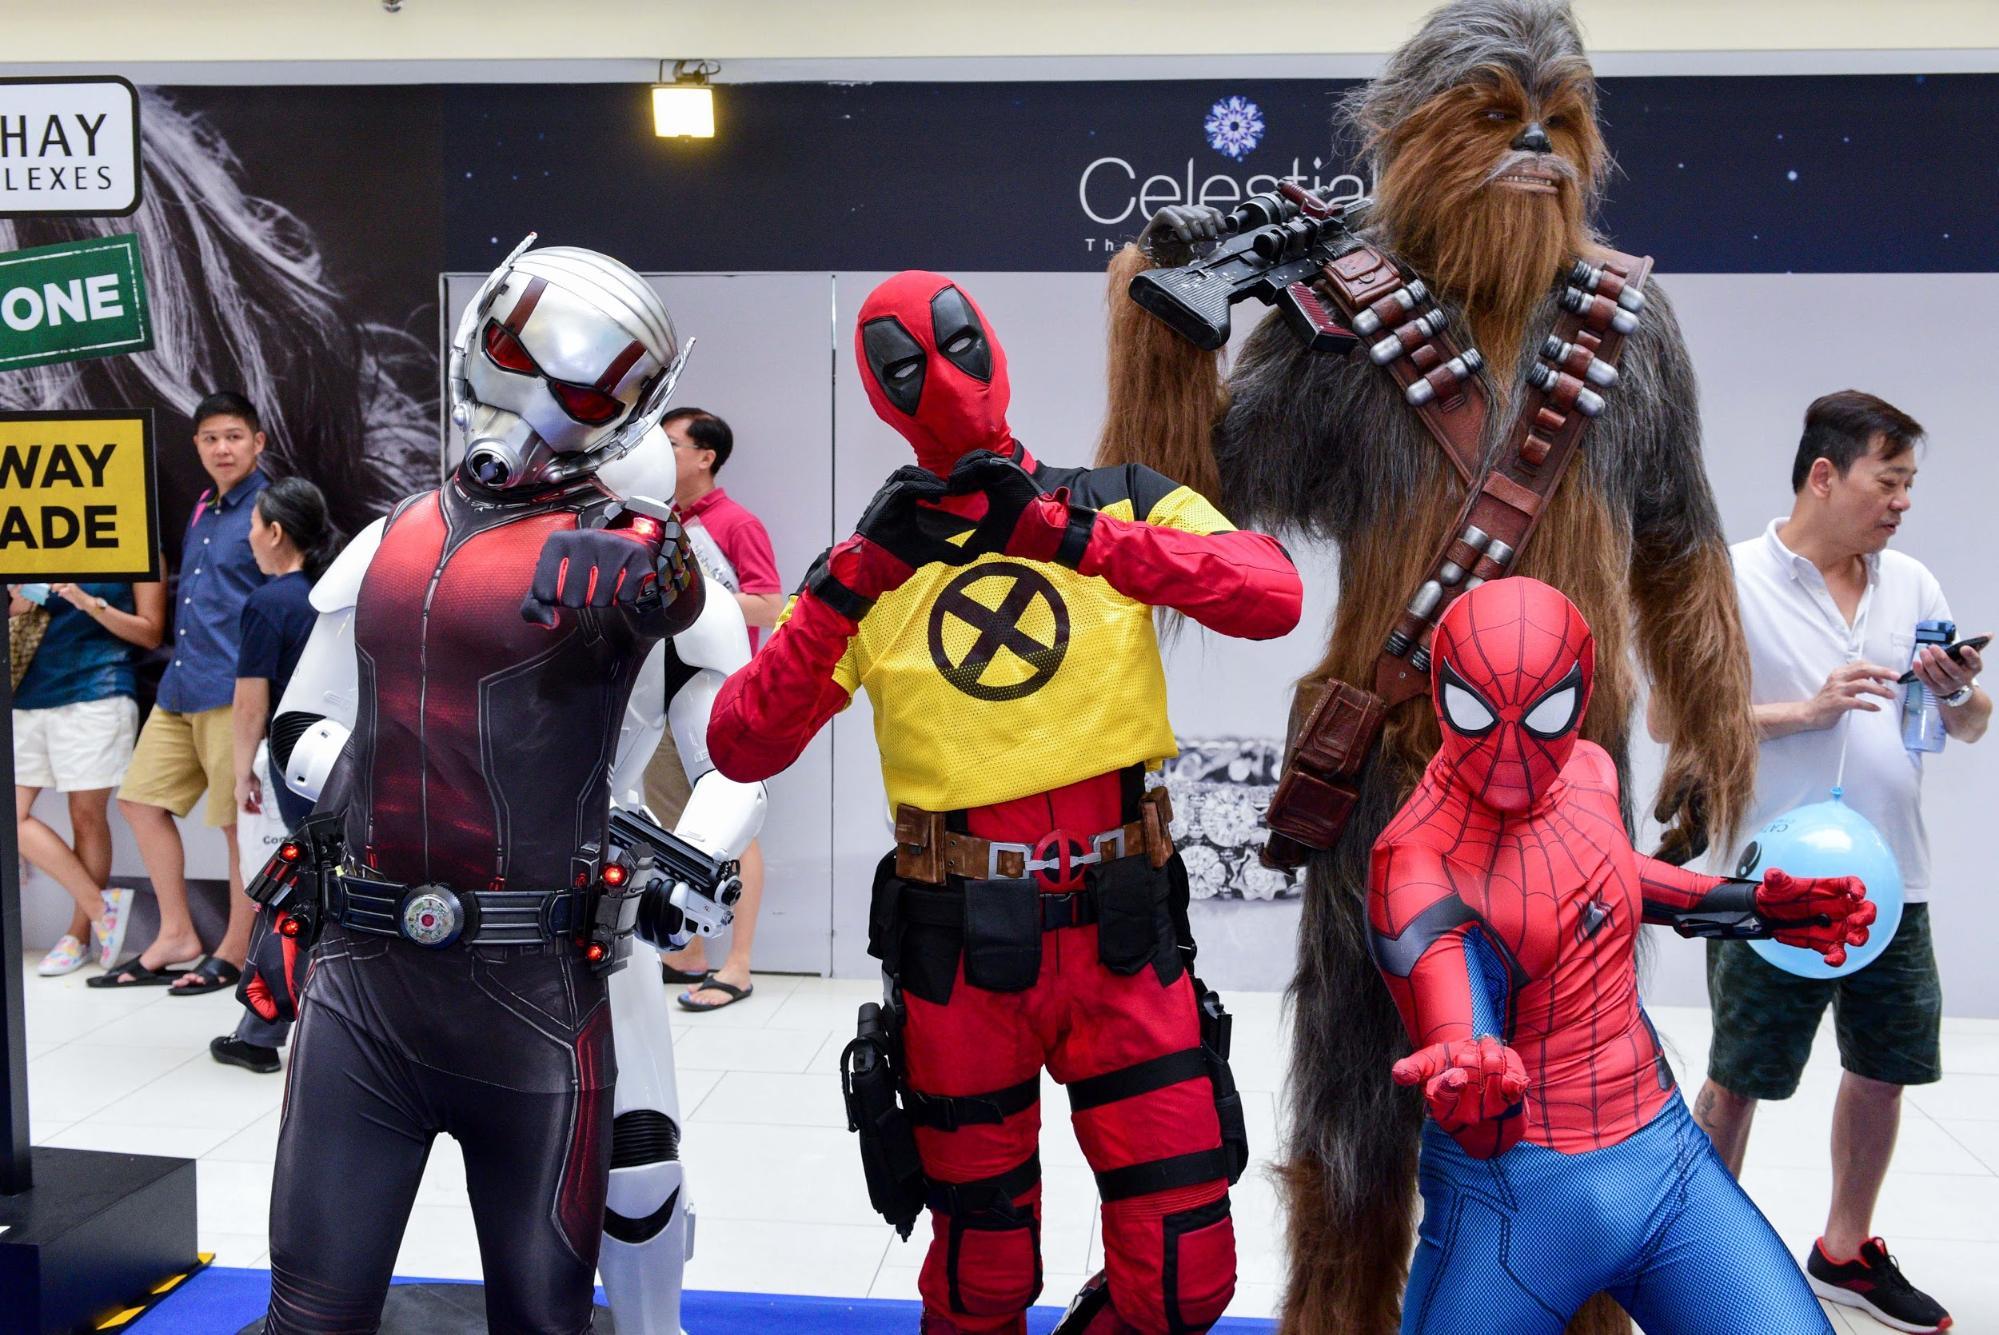 cathay cineplex amk hub - movie cosplay of deadpool, chewbacca, spiderman, antman